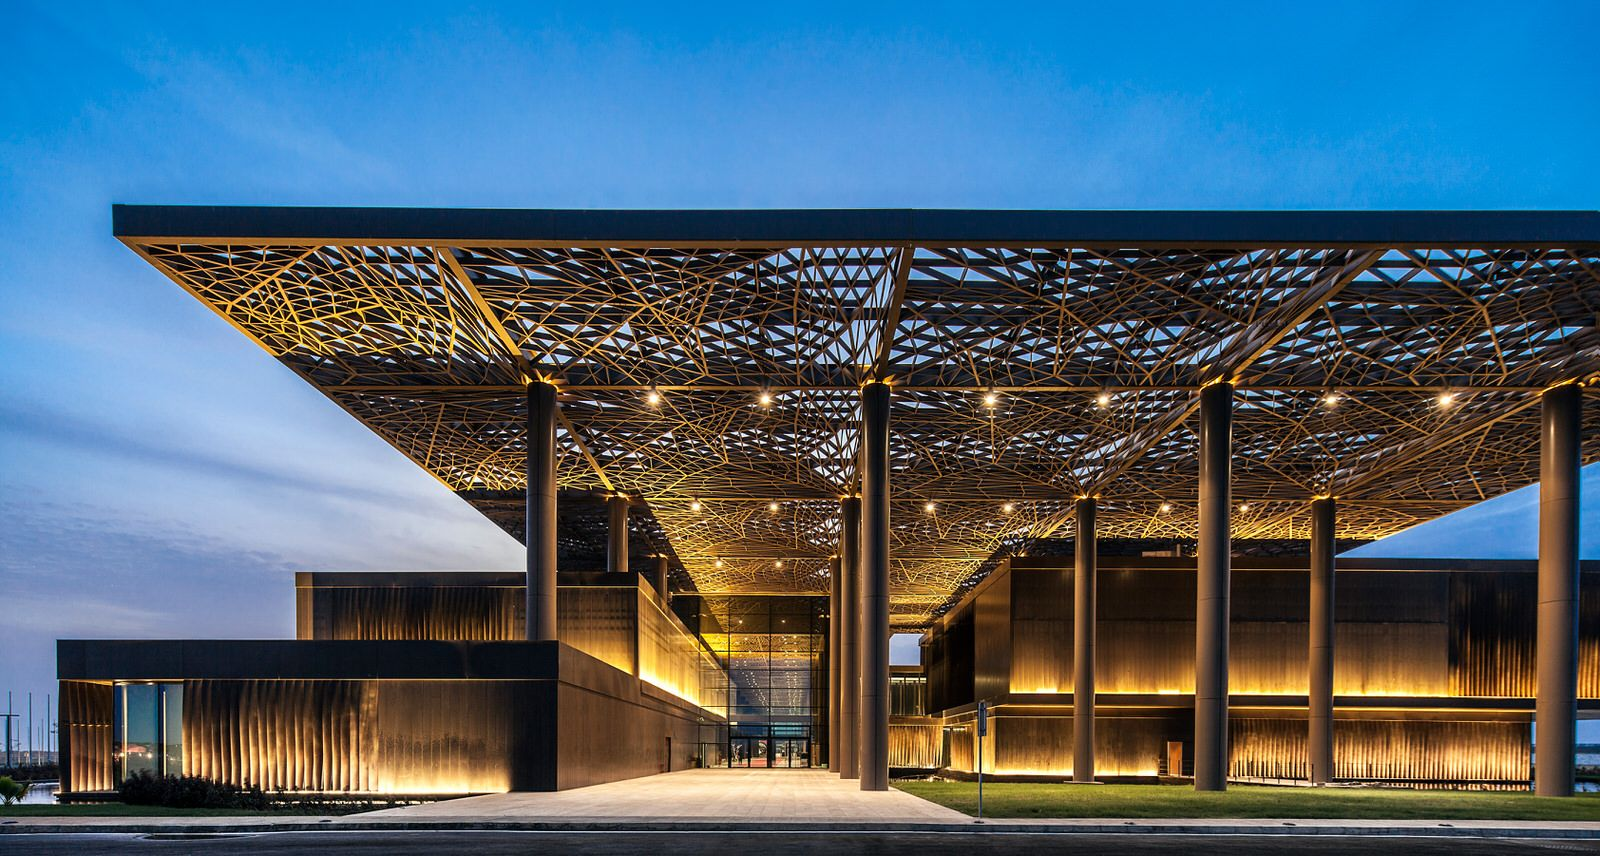 The winners of the 2015 LEAF Awards. This photo shows the Dakar Congress Center by Tabanlioglu Architects Melkan Gursel & Murat Tabanlioglu.